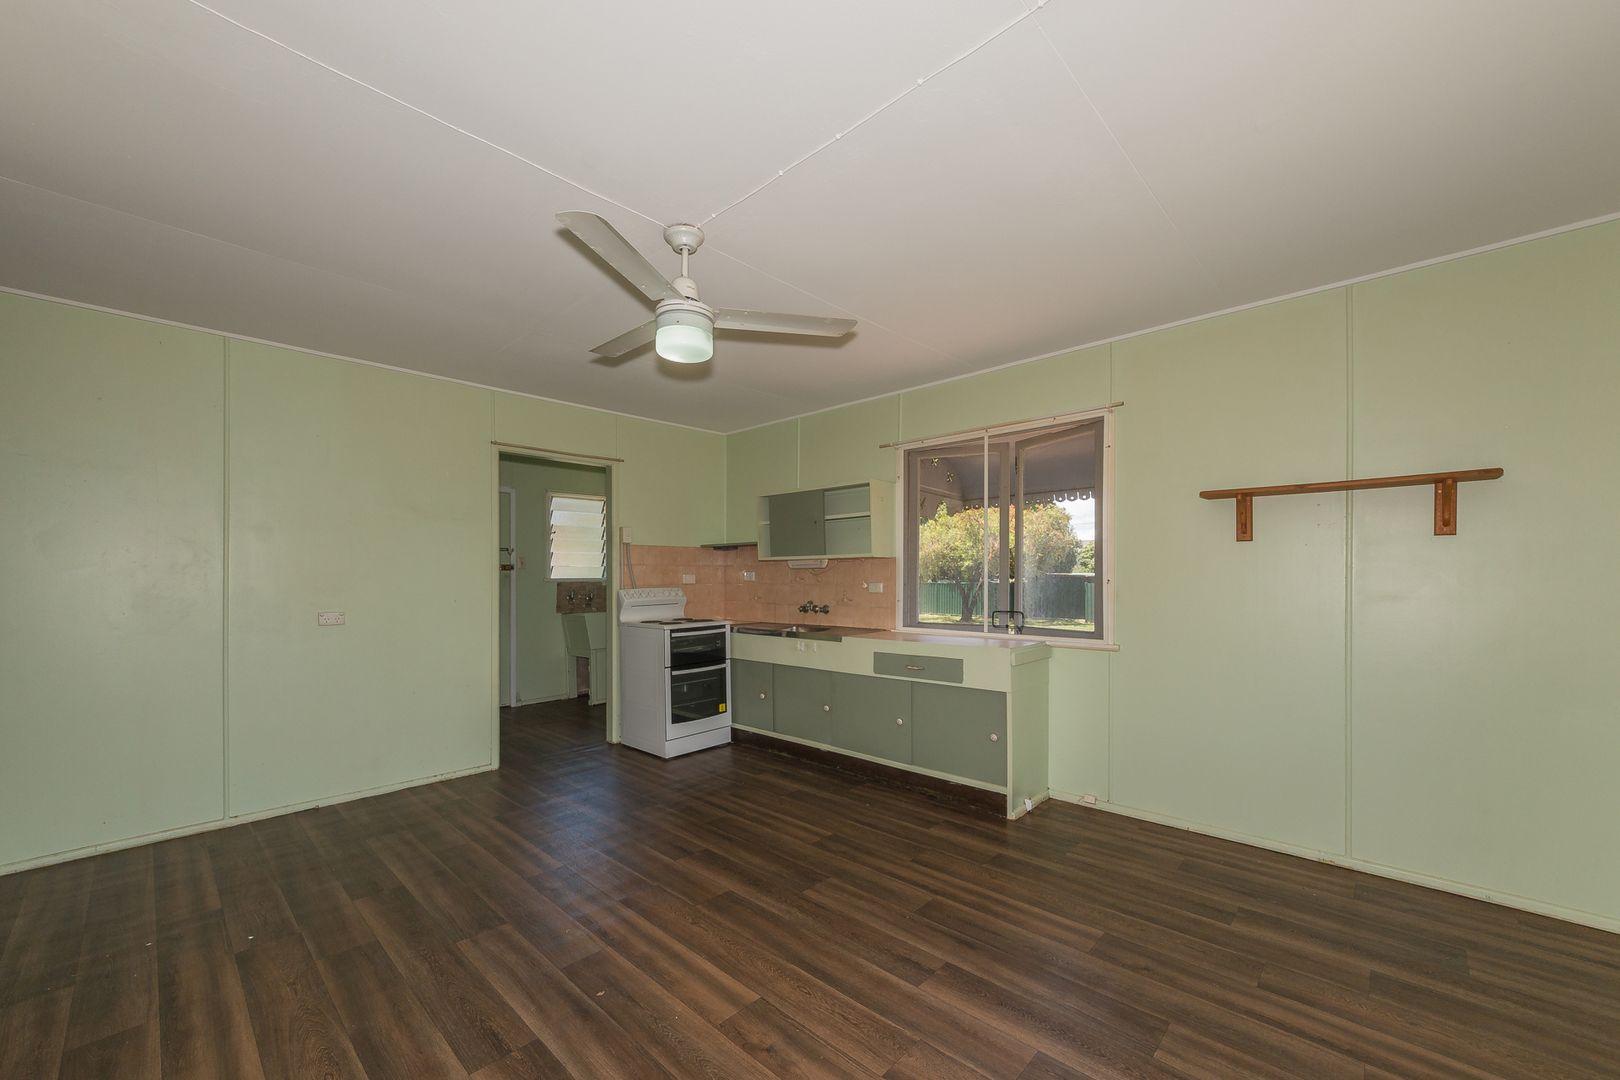 7/36 Cornelius Street, Clontarf QLD 4019, Image 1